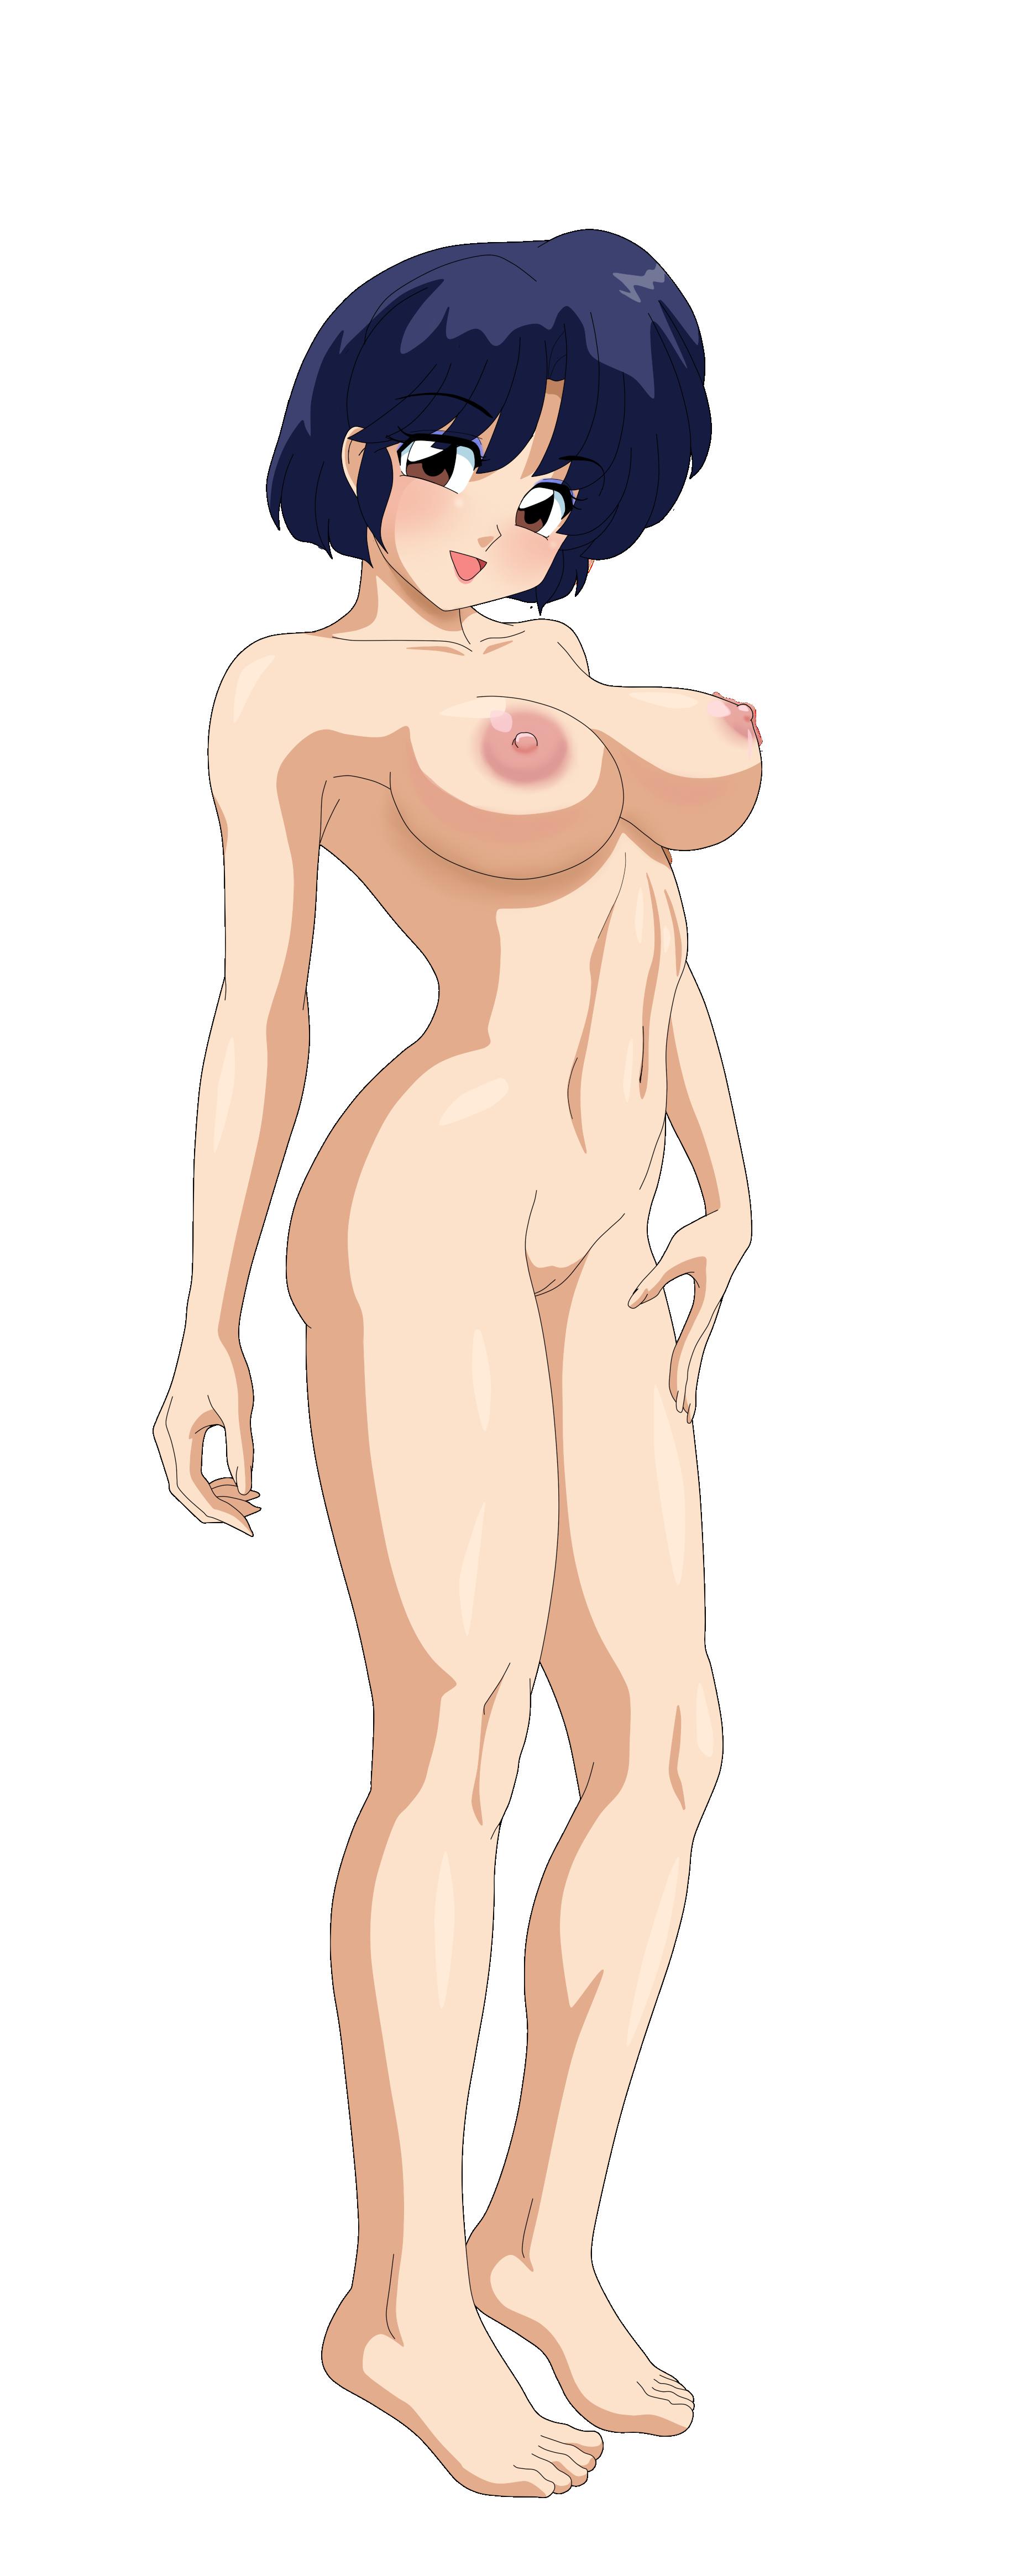 ranma hentai futanari